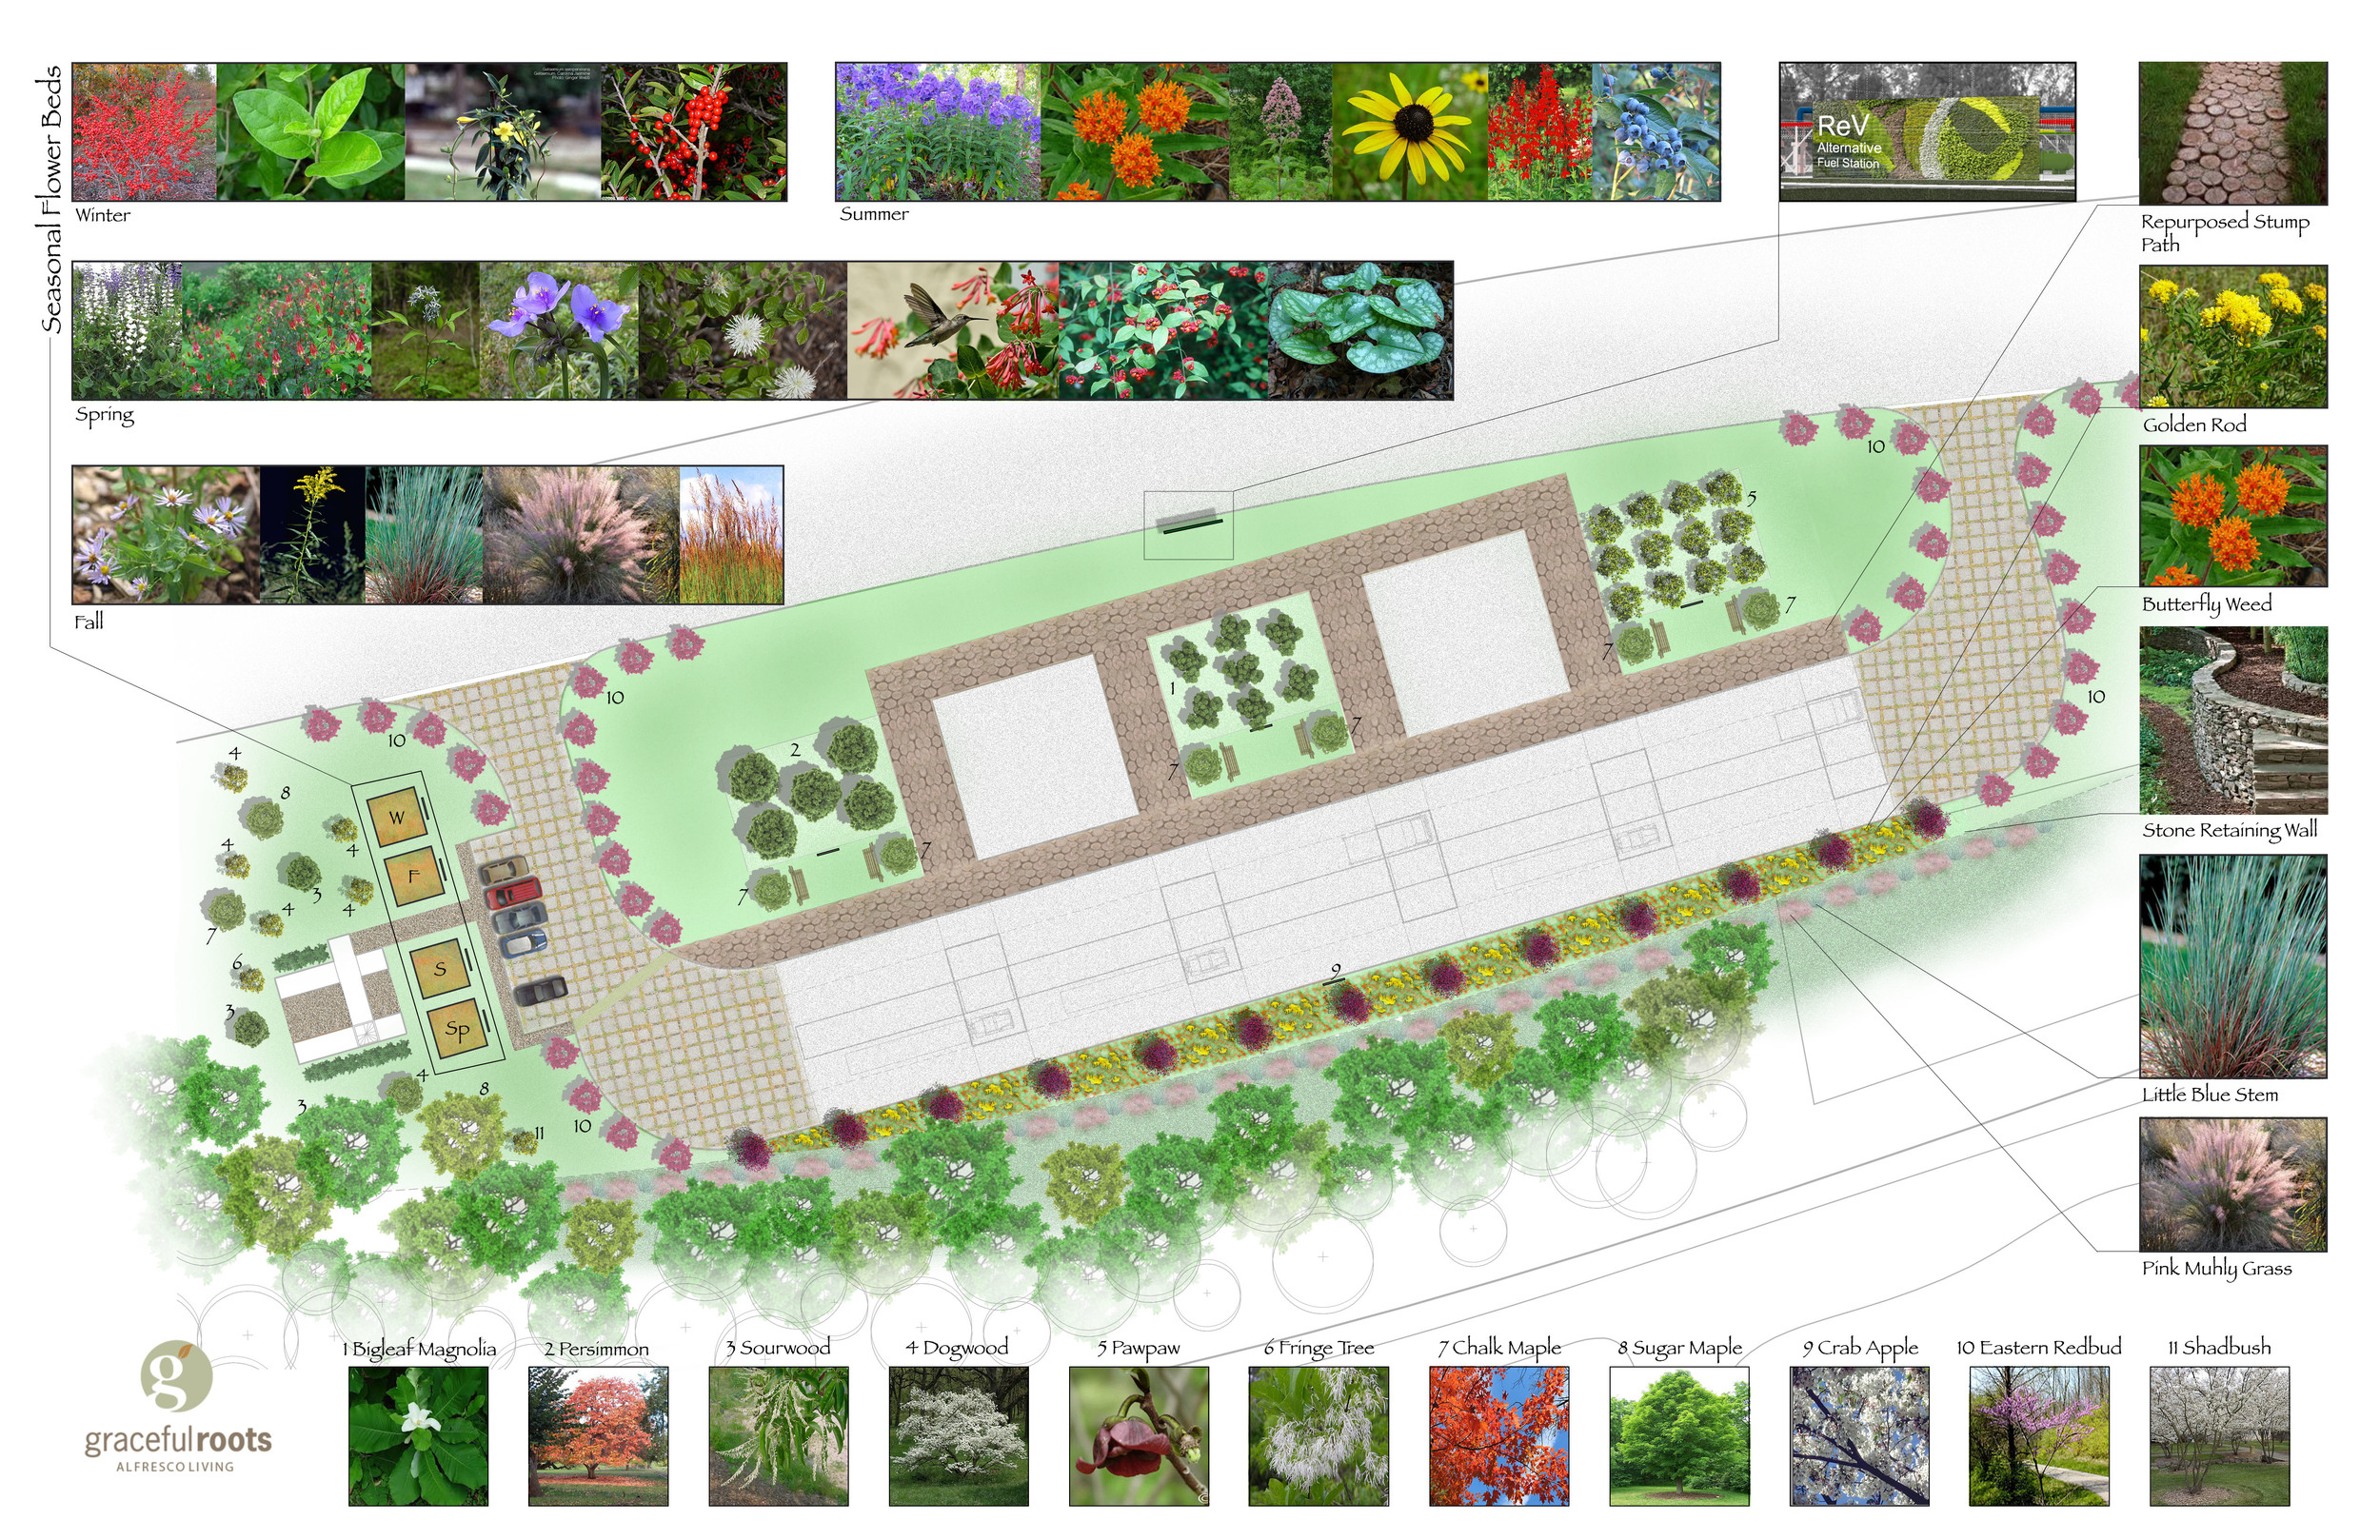 Proposal for Alternative Fueling Station at ReVenture Park from GR Team